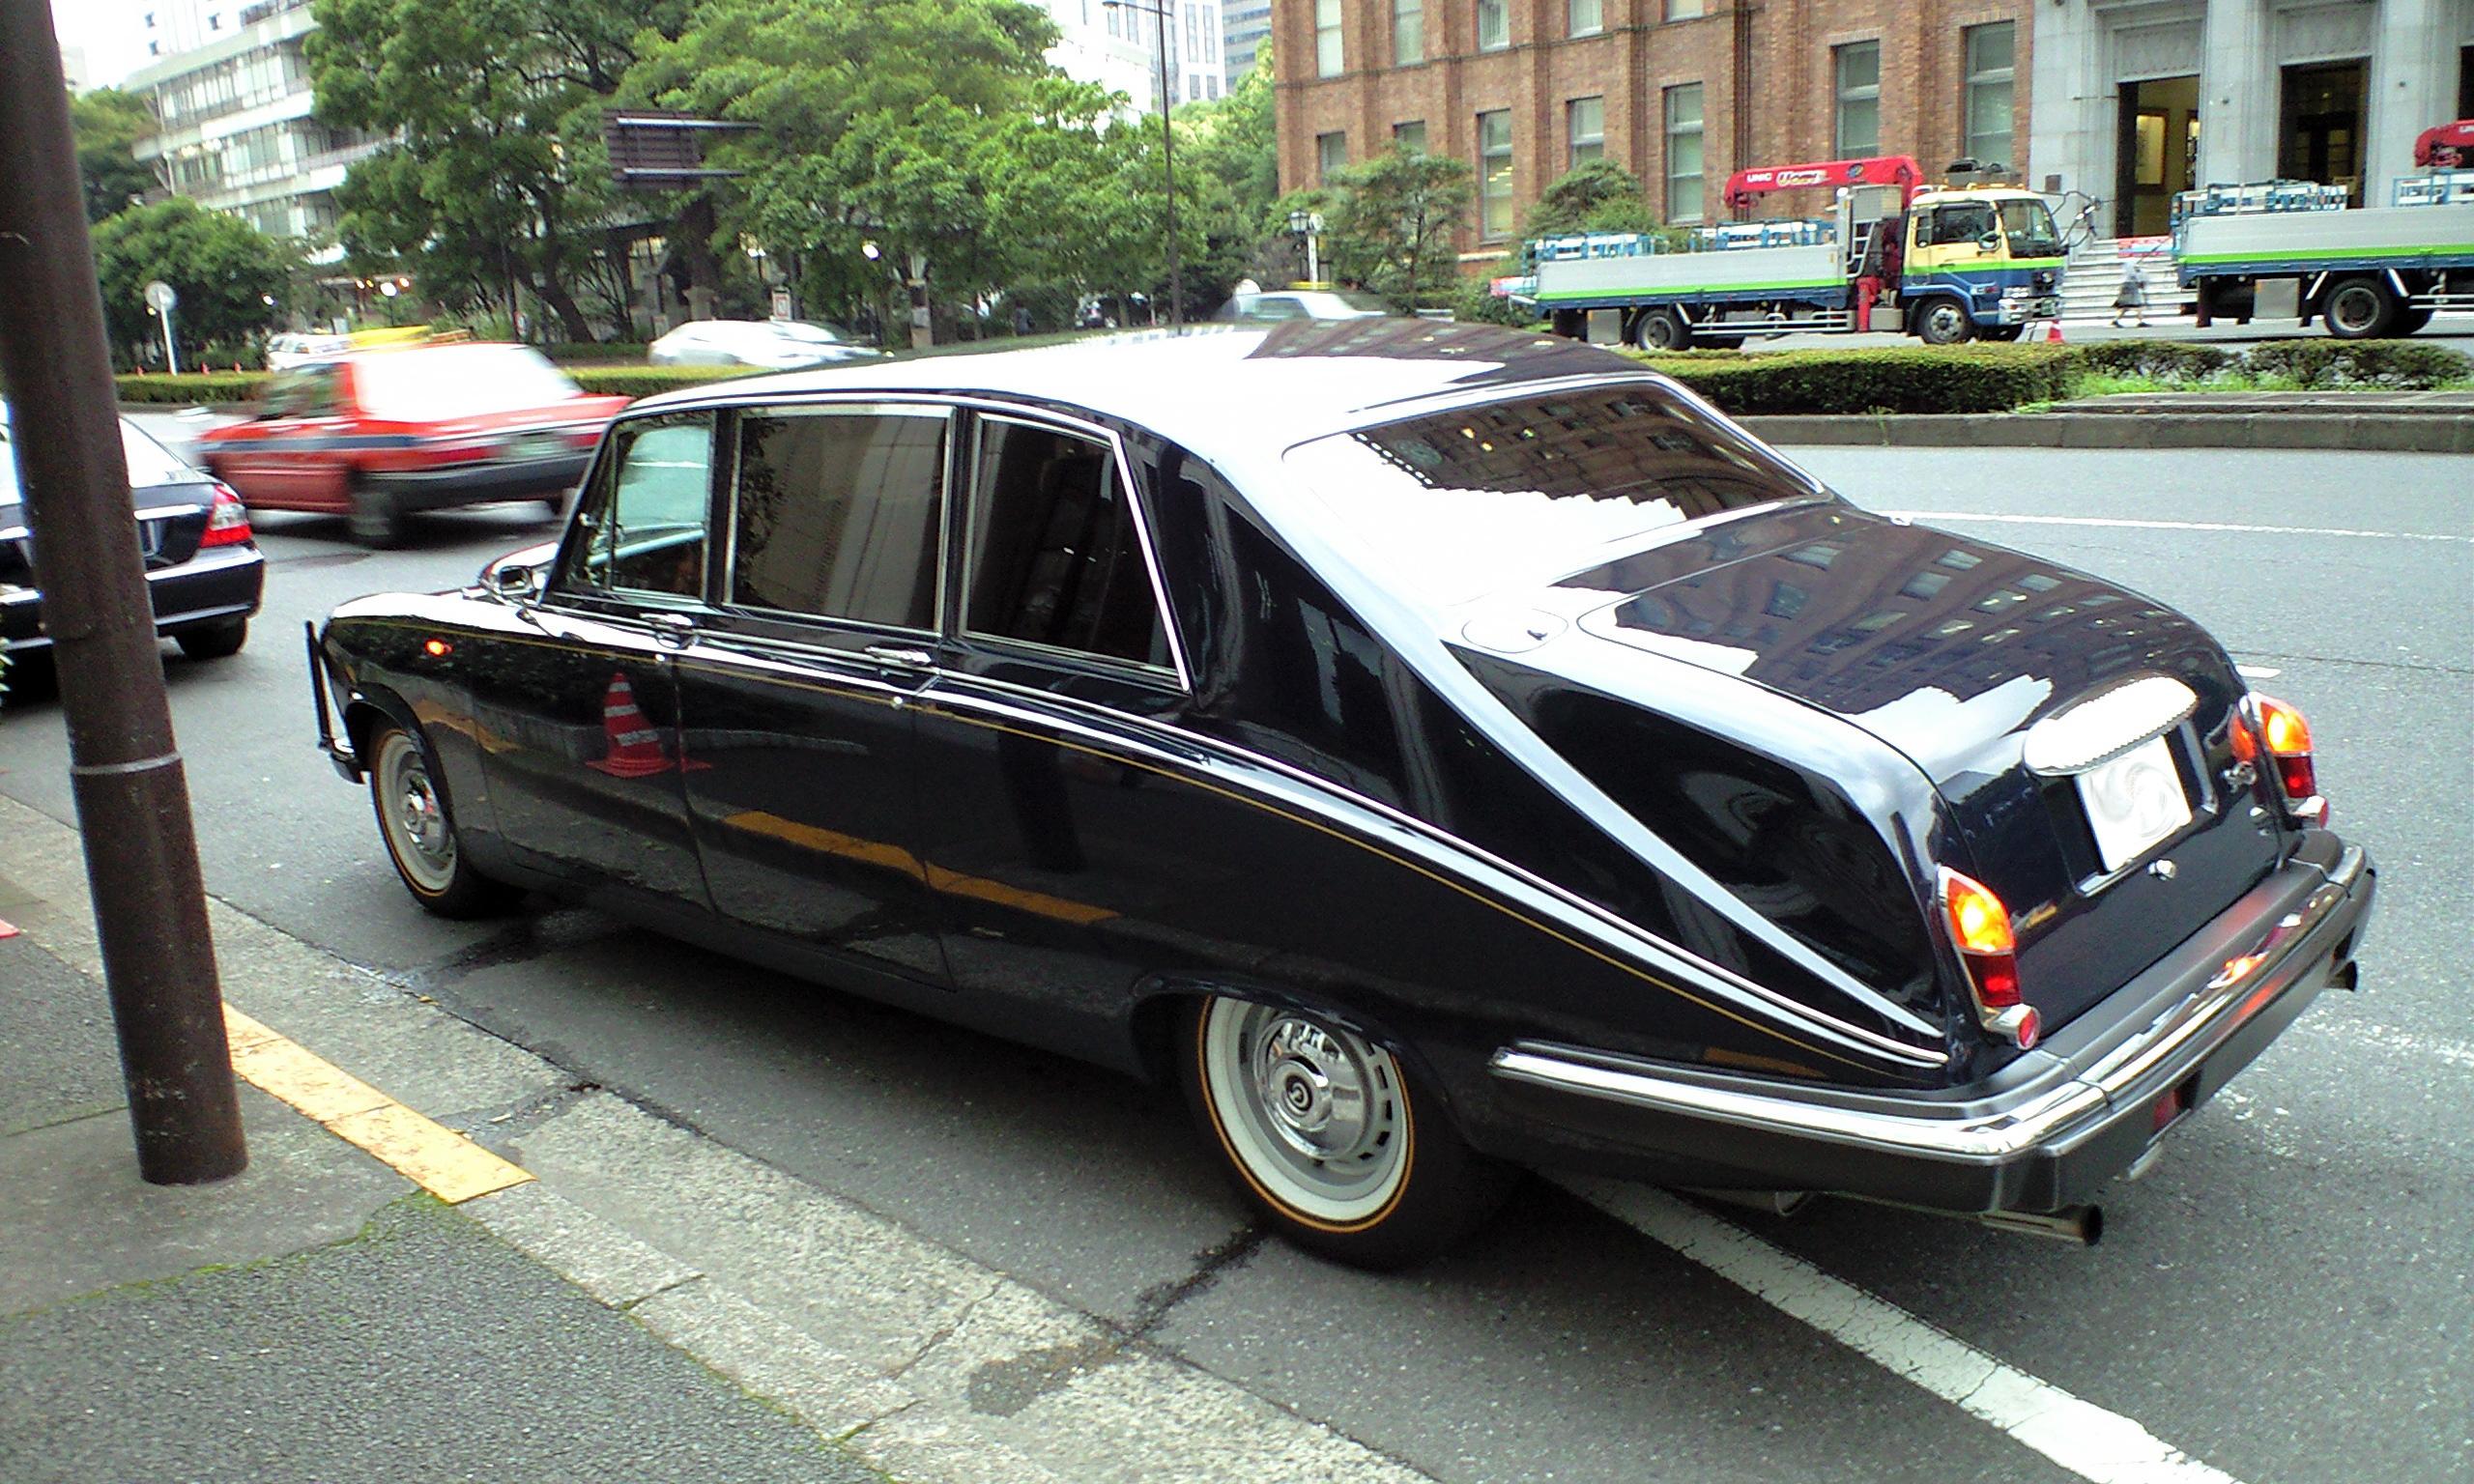 Rolls Royce Limo >> File:Daimler DS420 Limousine rear.jpg - Wikimedia Commons